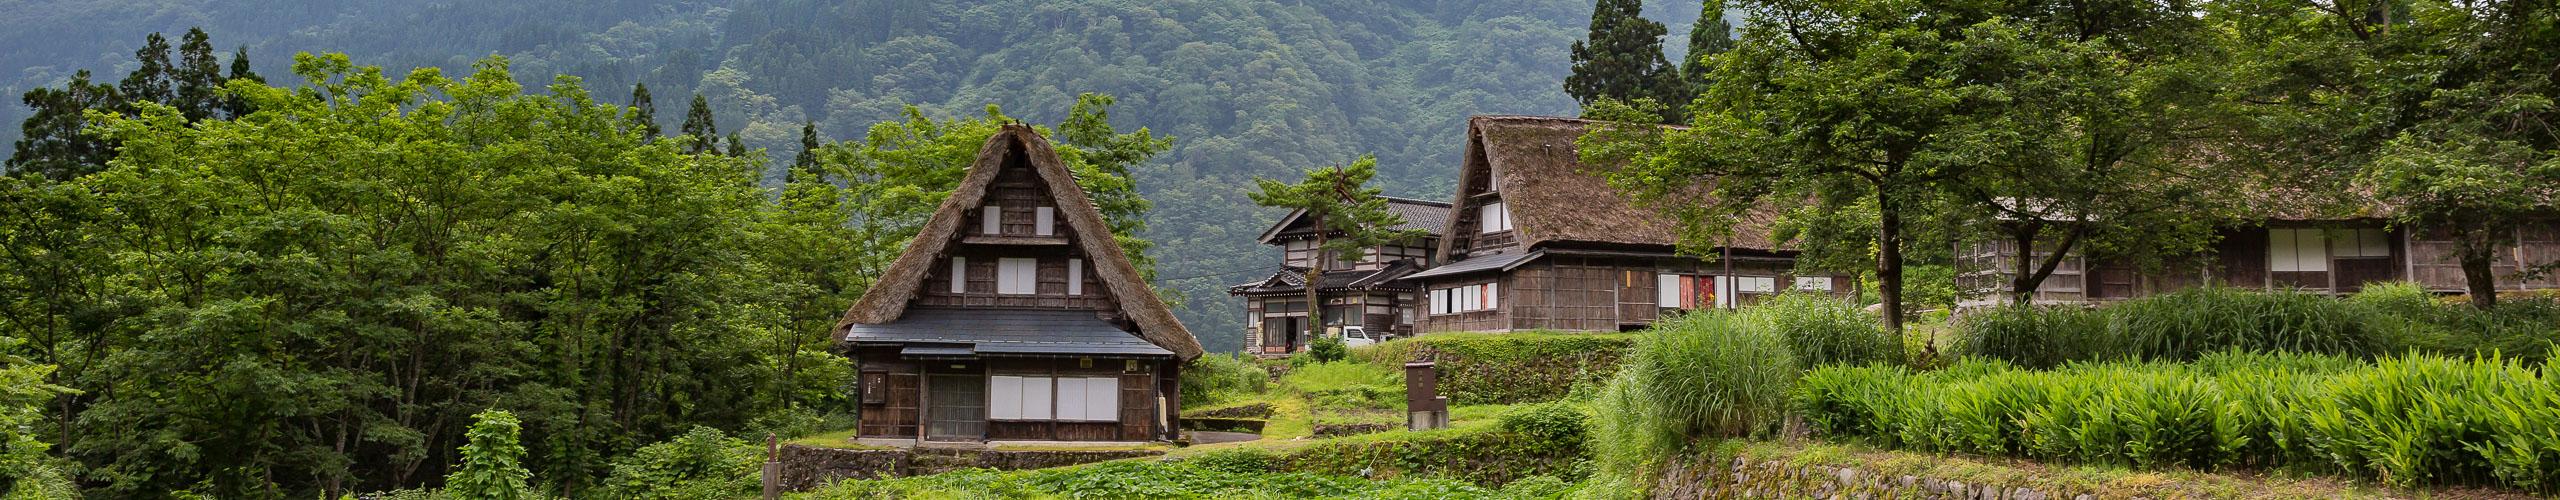 Benoa in Japan